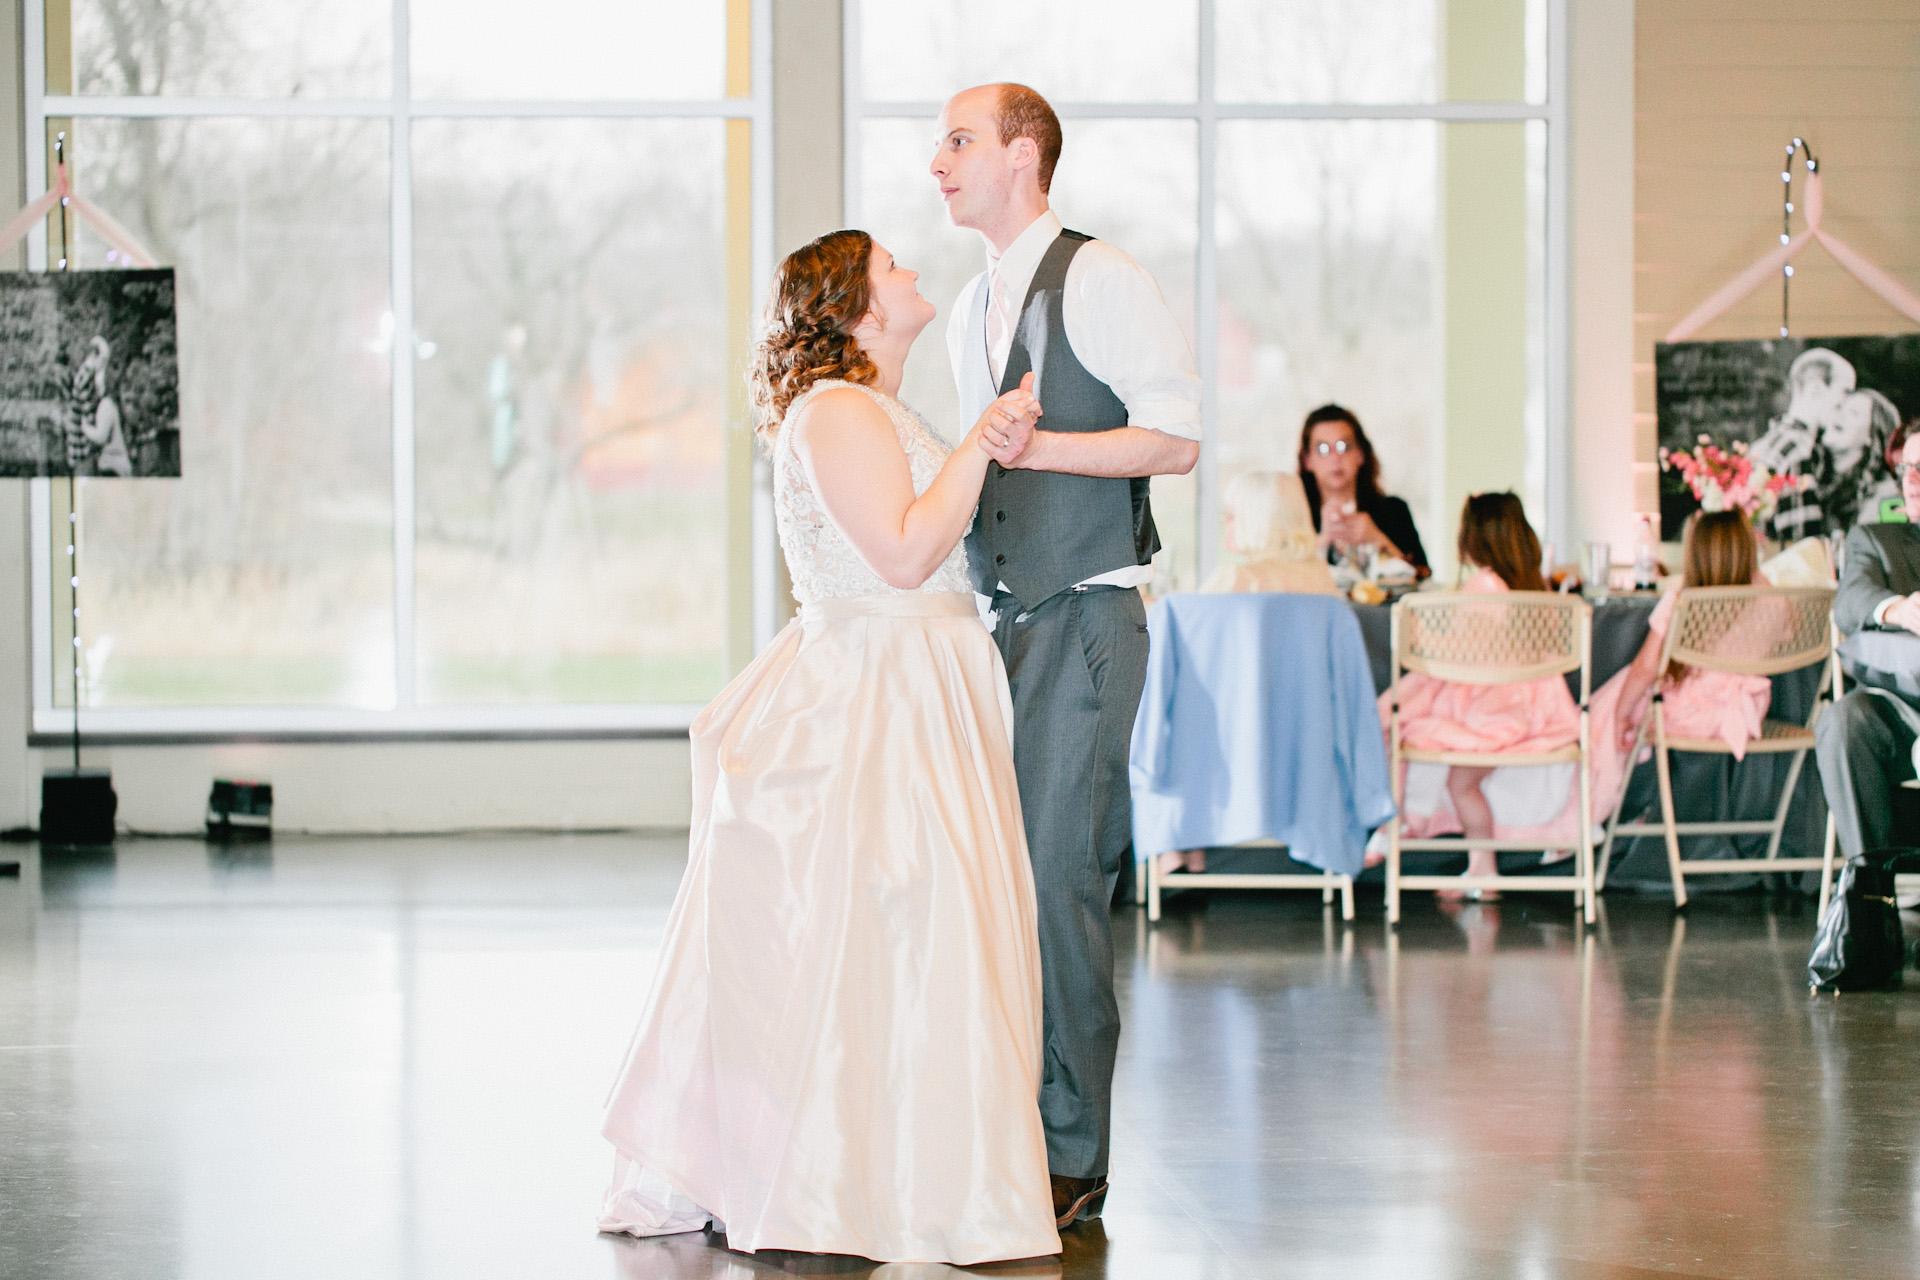 using off camera flash at a wedding reception canon